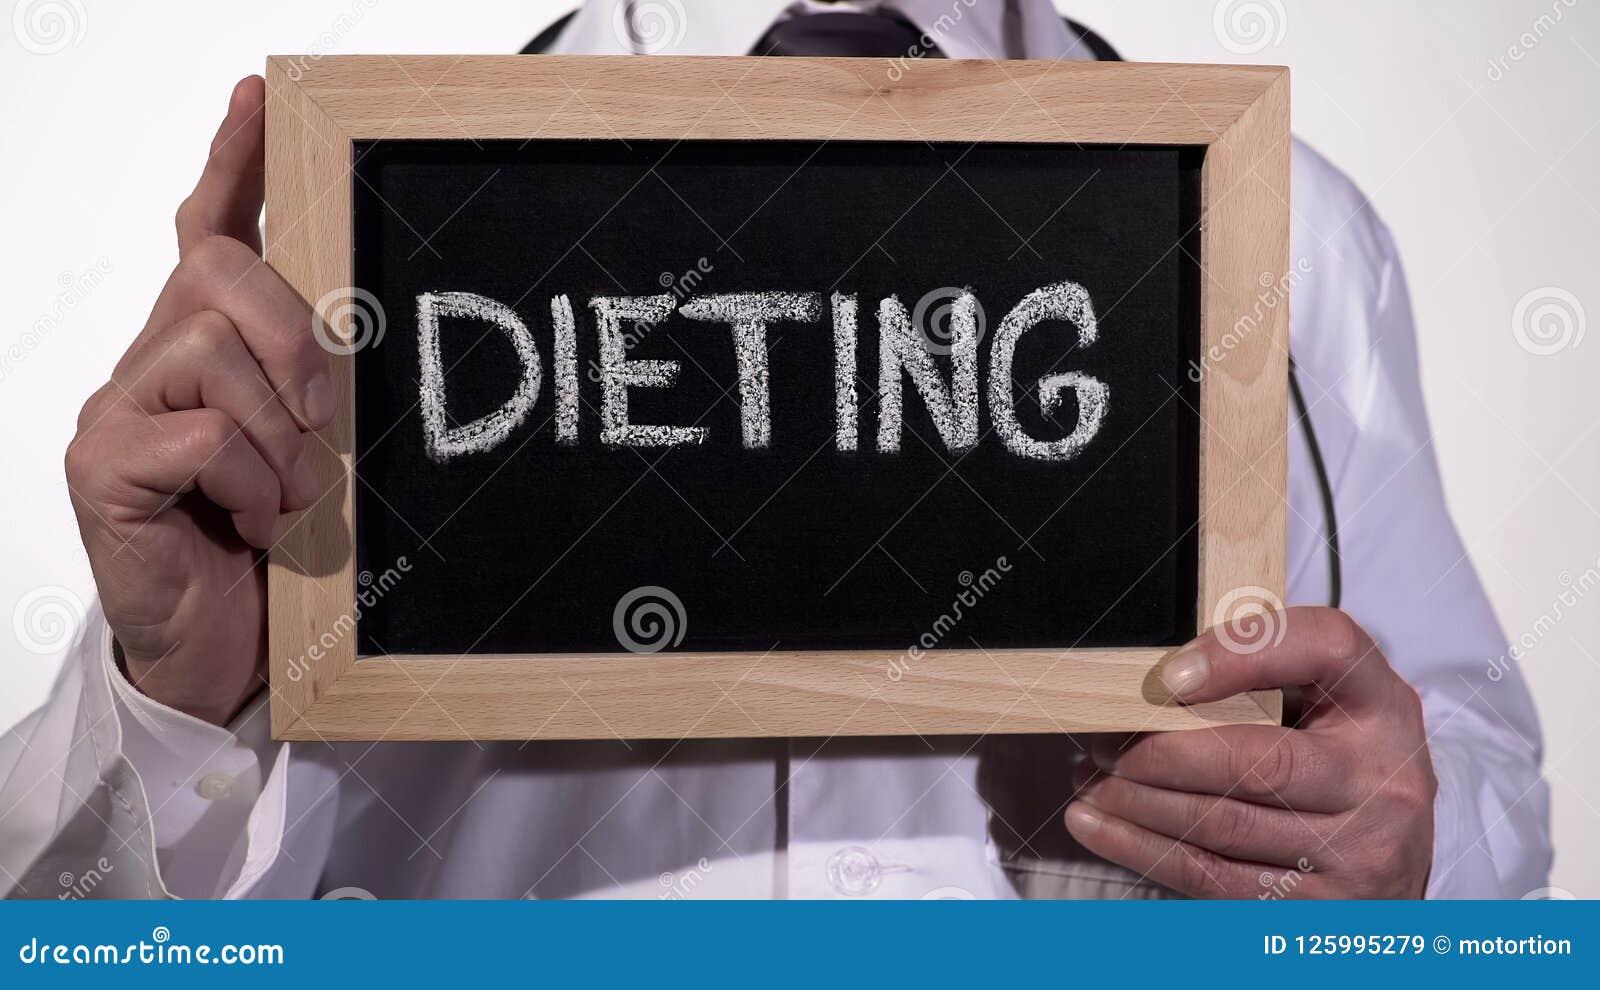 Dieting written on blackboard in doctor hands, nutritionist recommendations